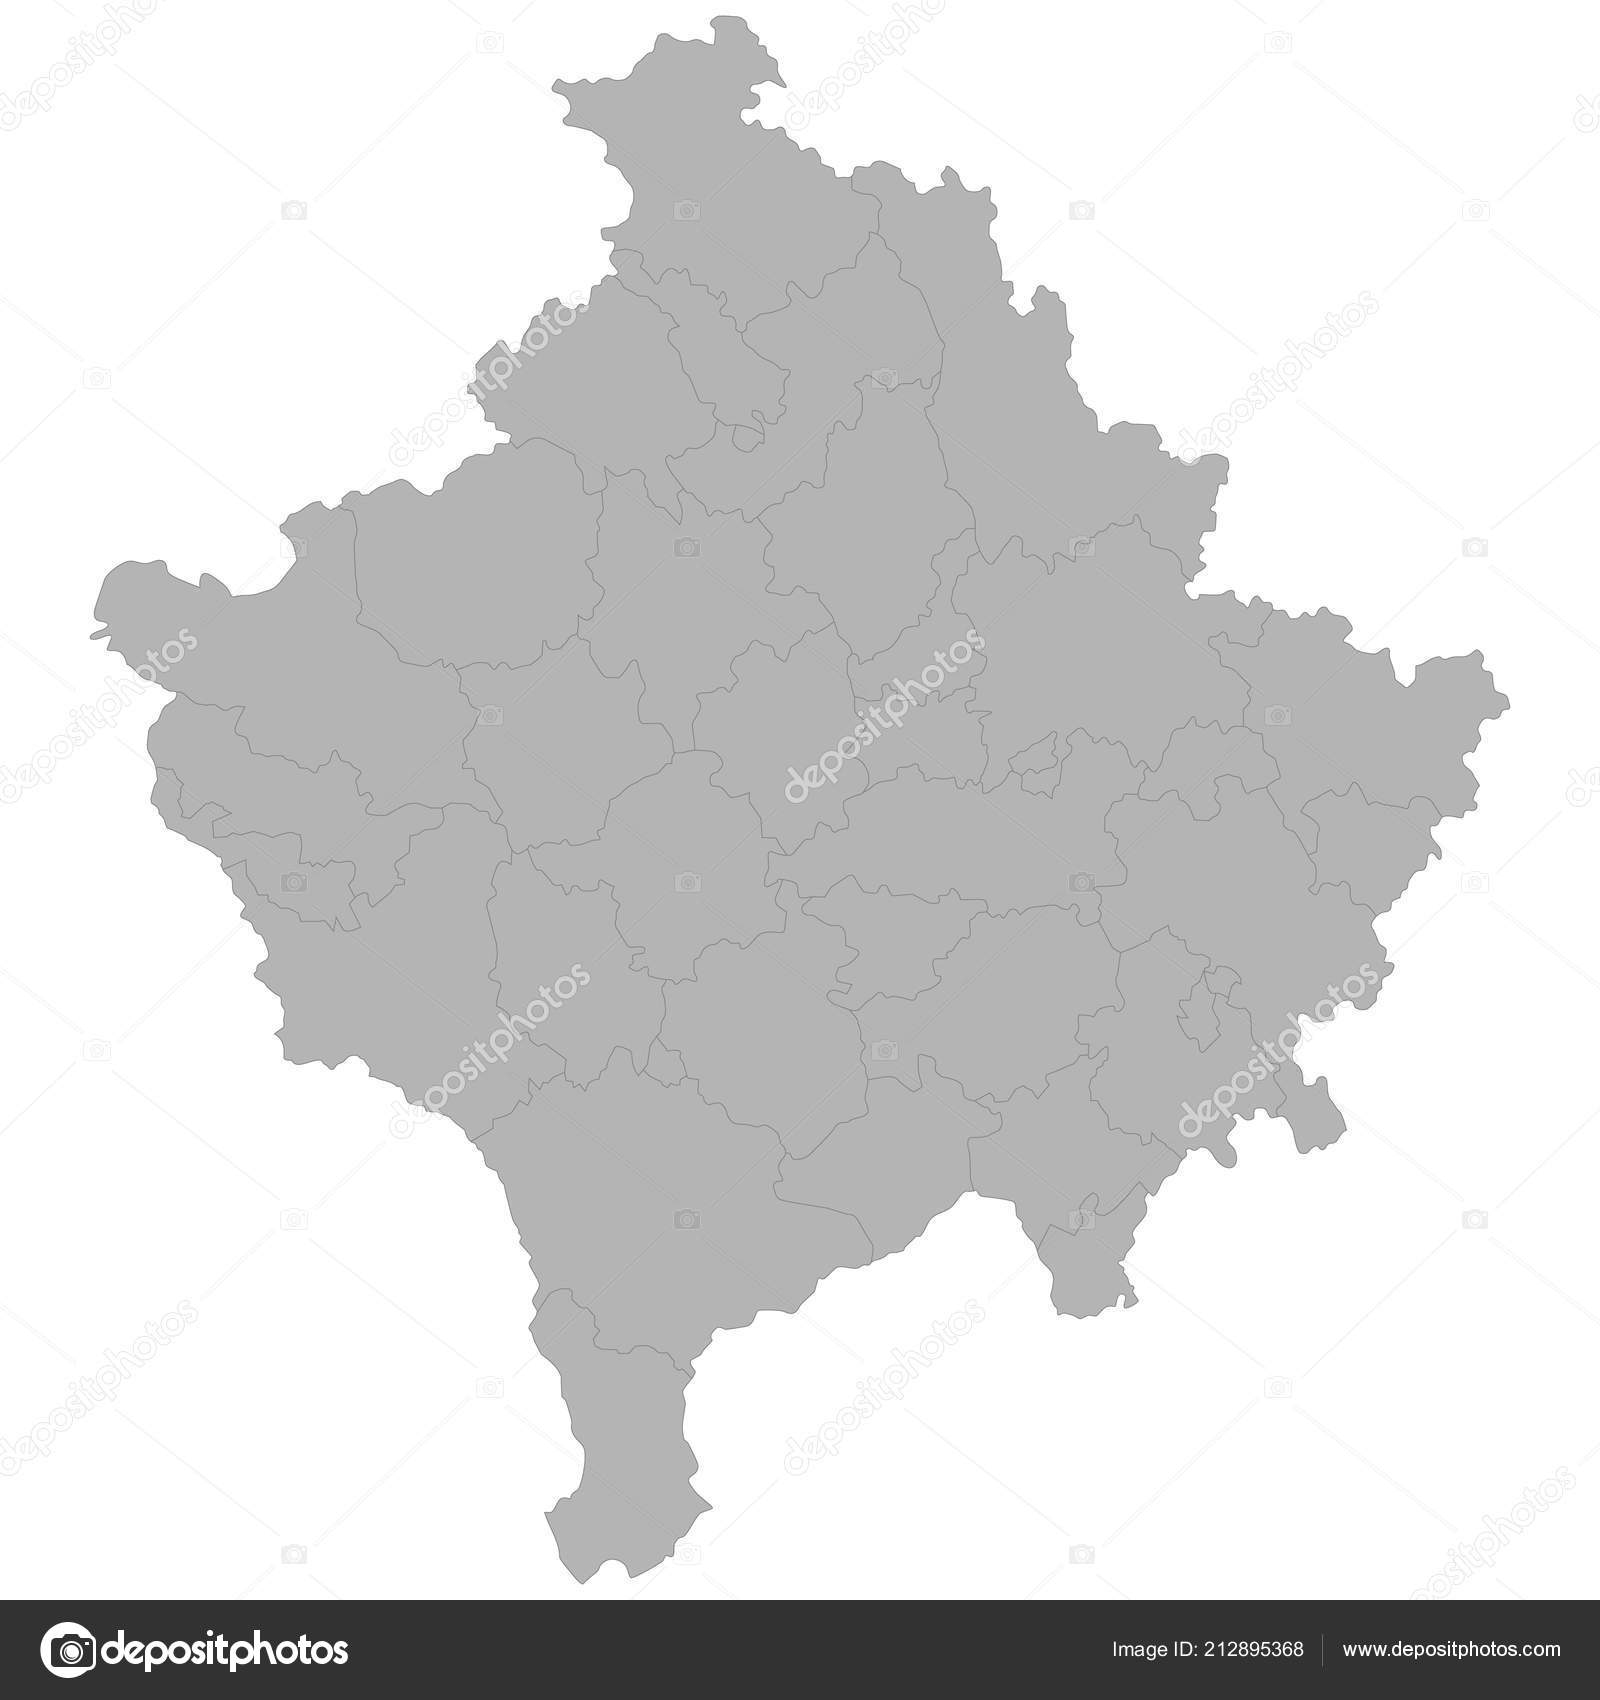 High Quality Map Kosovo Borders Regions White Background — Stock on india map, europe map, macedonia map, pri�tina, russia map, greece map, abkhazia map, vojvodina map, bosnia and herzegovina, bosnia and herzegovina map, luxembourg map, montenegro map, balkans map, road map, afghanistan map, algeria map, serbia map, malaysia map, rita ora, bosnian war, breakup of yugoslavia, kuwait map, malta map, prizren map, republic of macedonia, liechtenstein map,